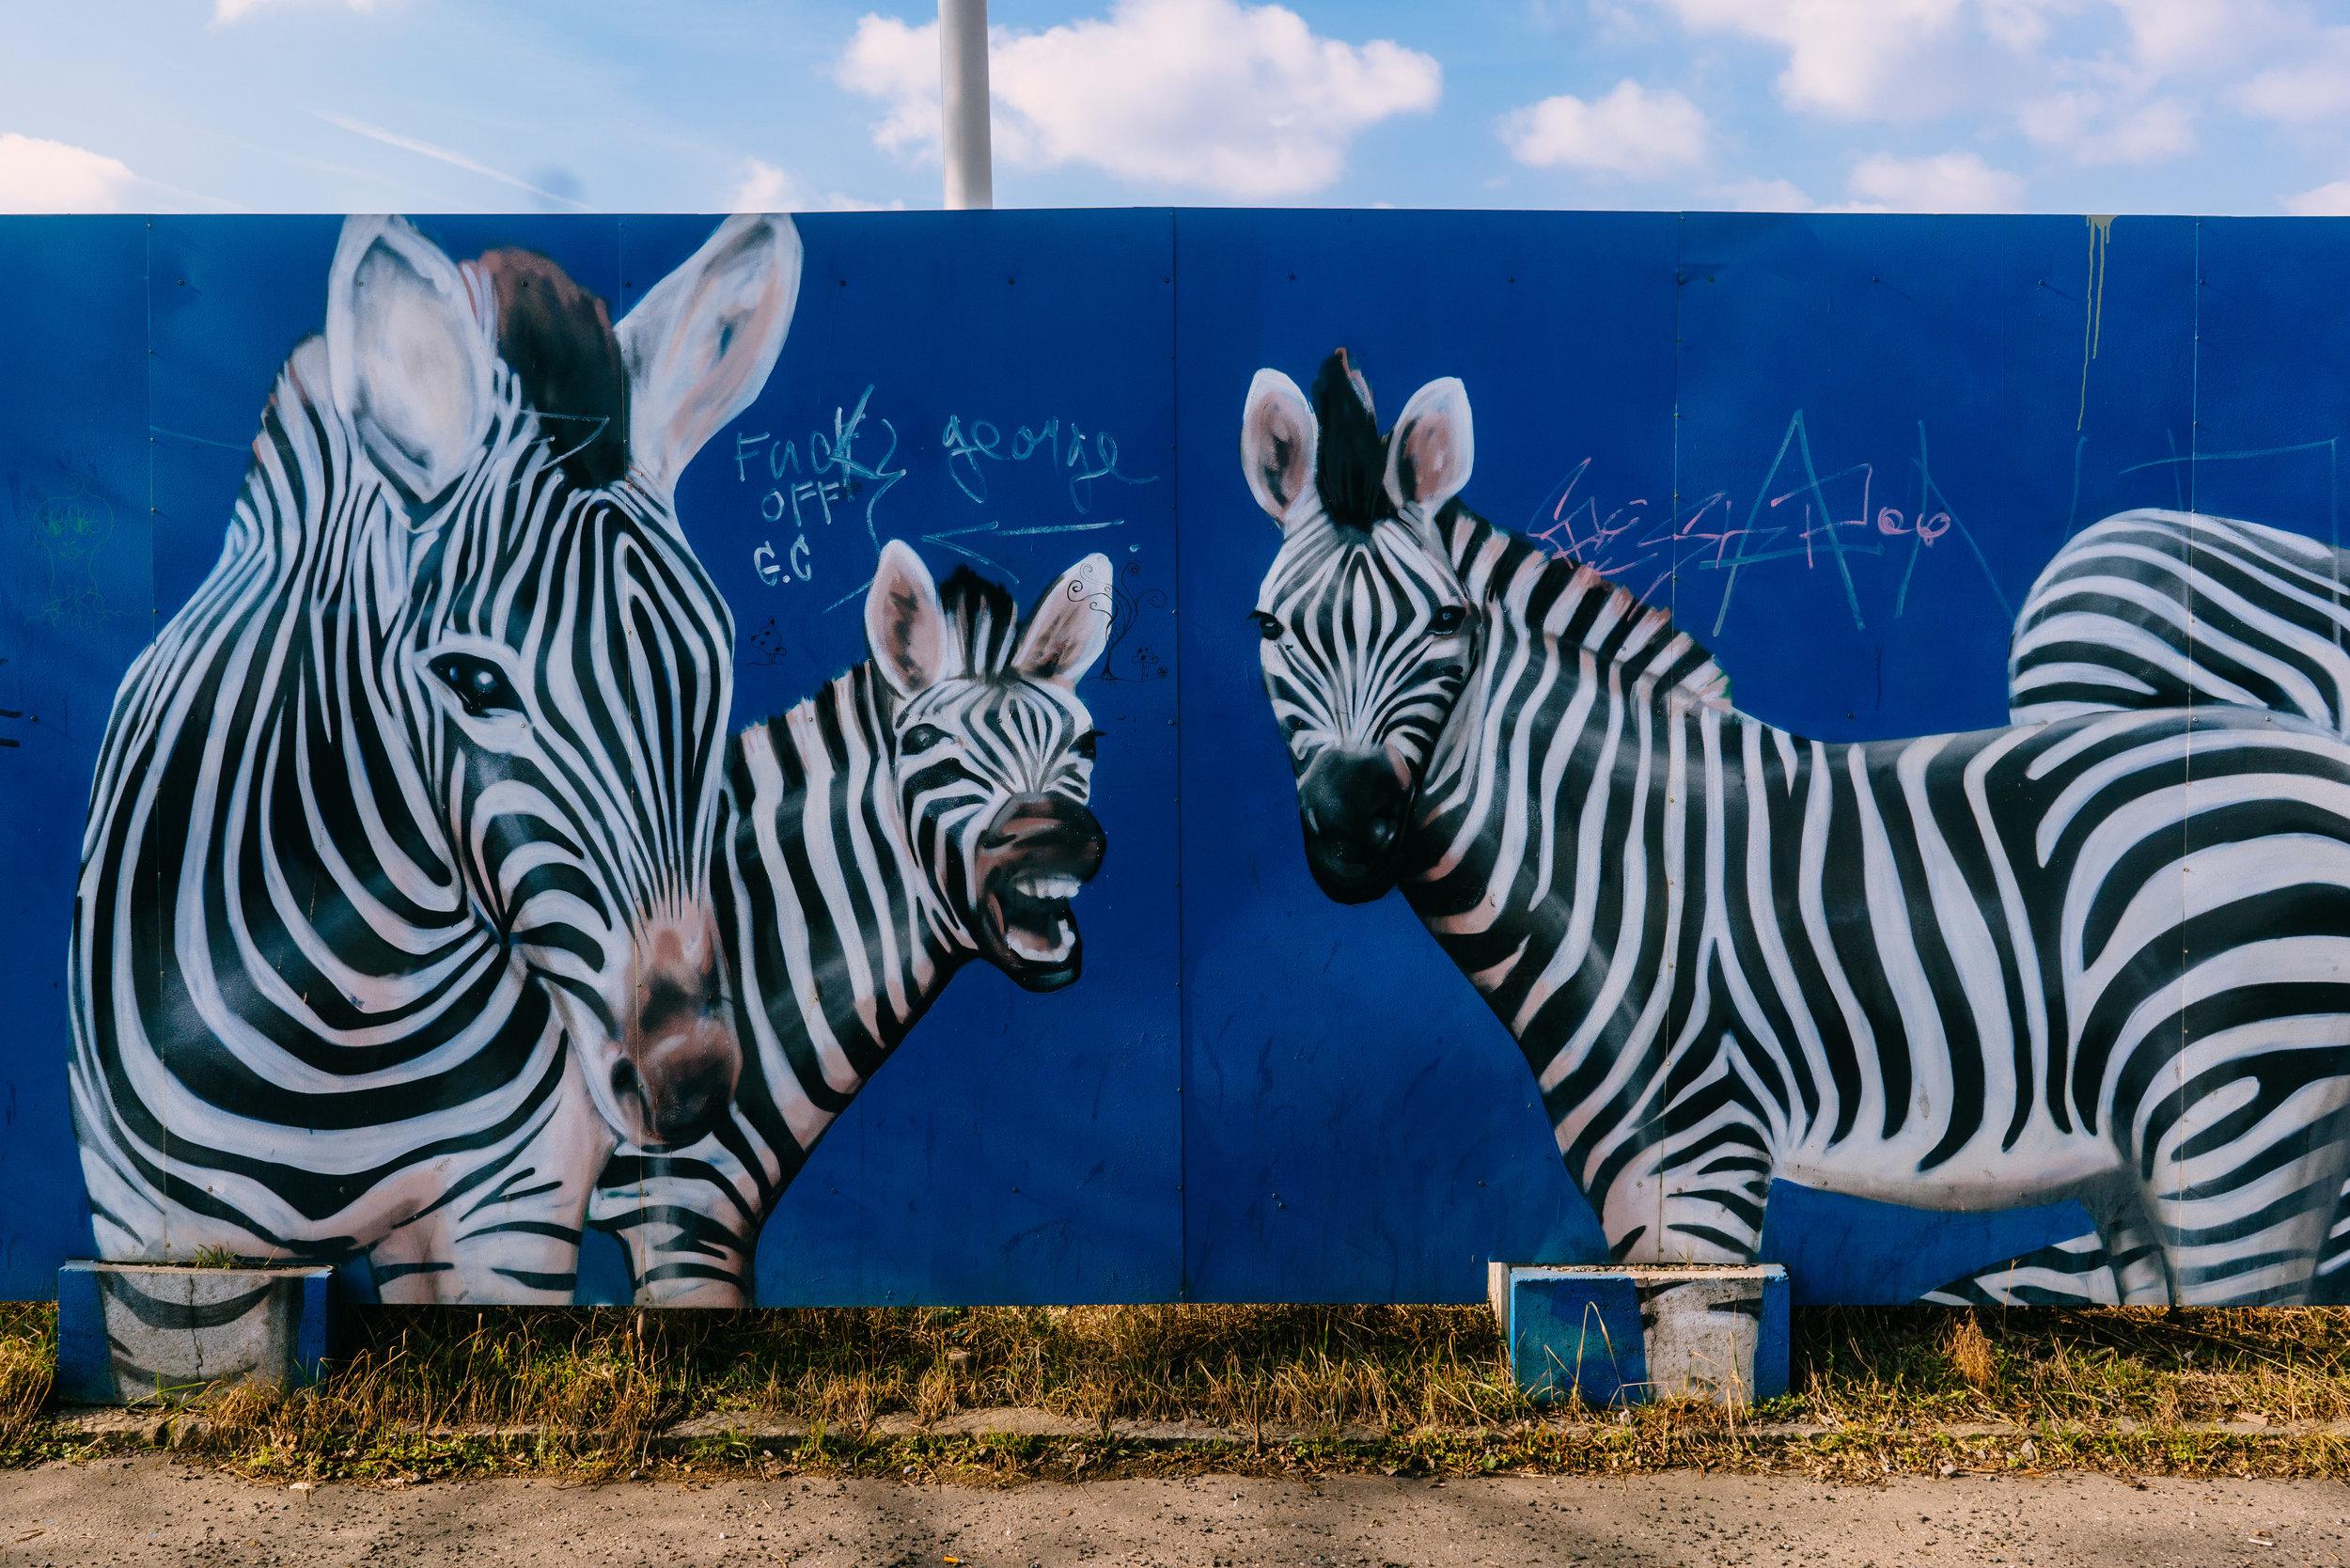 Street art in Prague, zebras